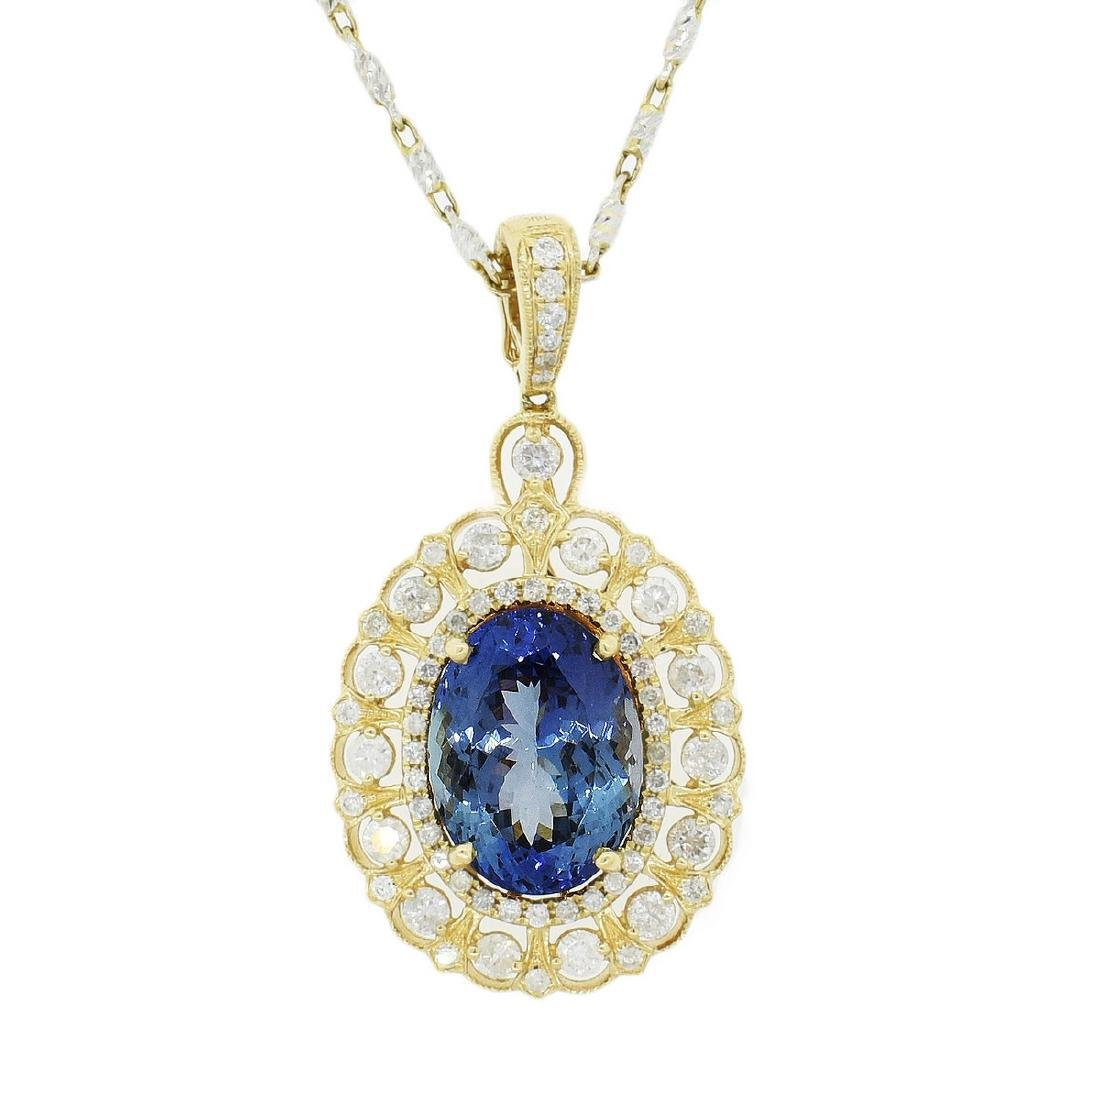 14K Gold 8.35ct Tanzanite 1.28ct Diamond Necklace